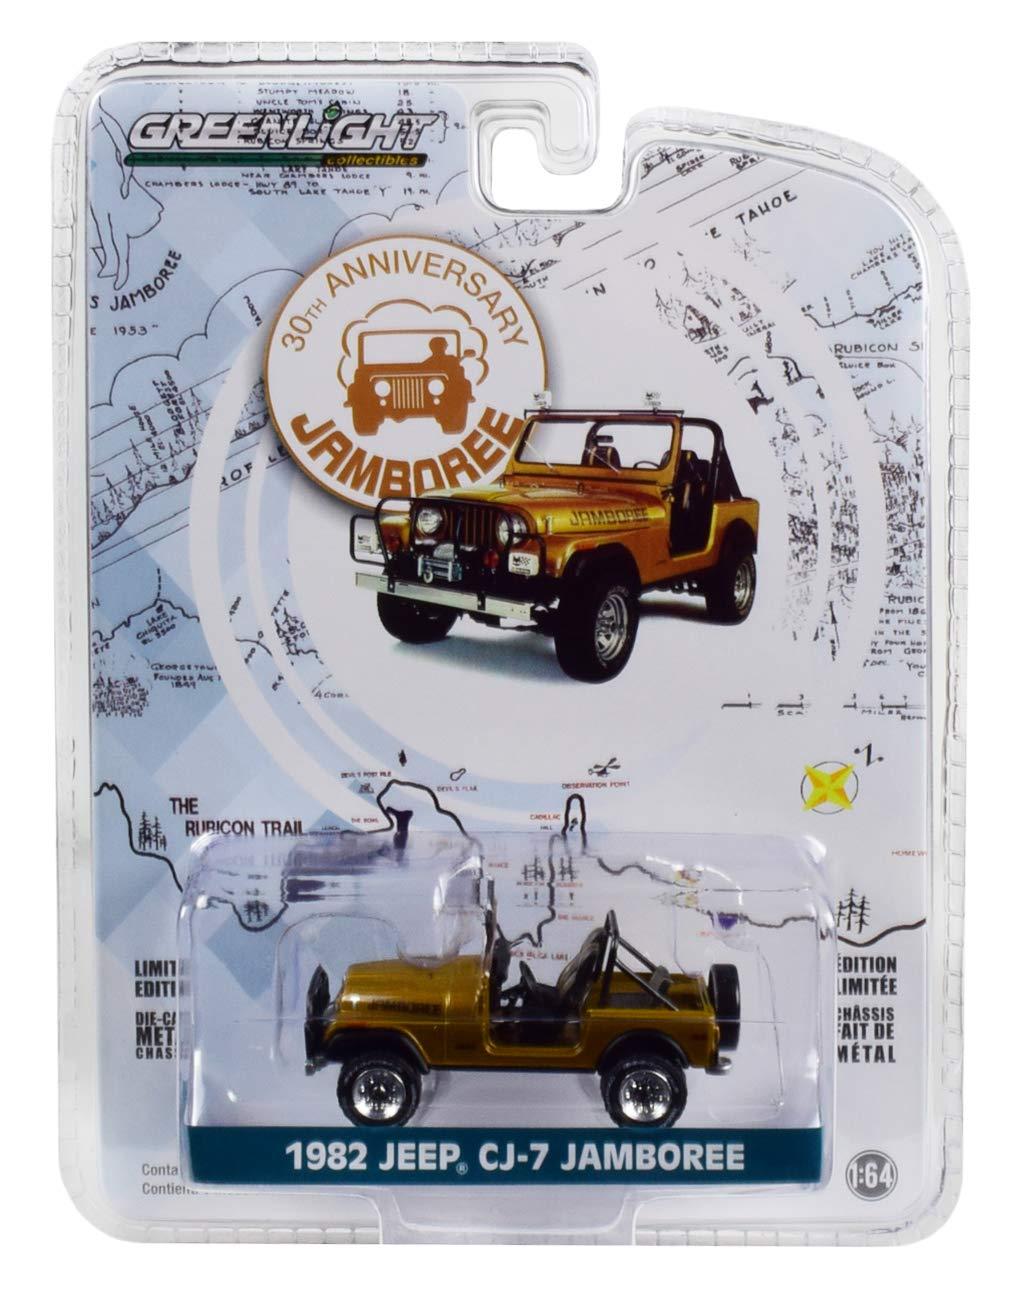 Anniversary Collection Series 7 1//64 Diecast Car by Greenlight 27970 D 1982 Jeep CJ-7 Jamboree Gold 30th Anniversary Jamboree Commemorative Ed